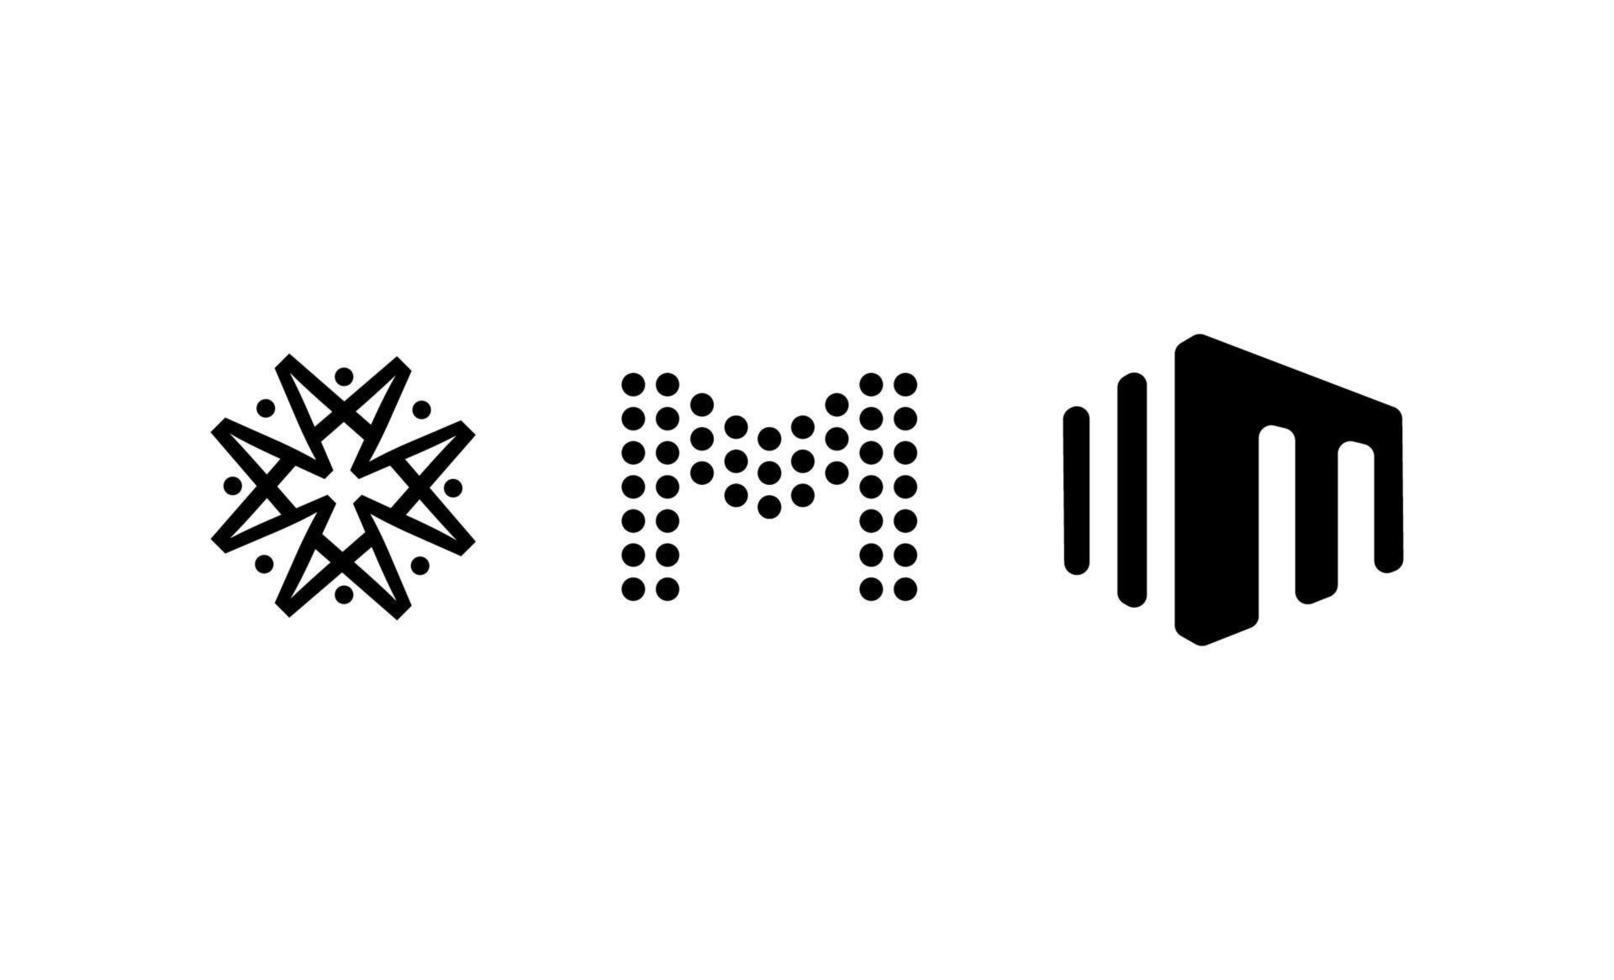 anfängliche m Logo Vorlage Design Vektor-Illustration vektor